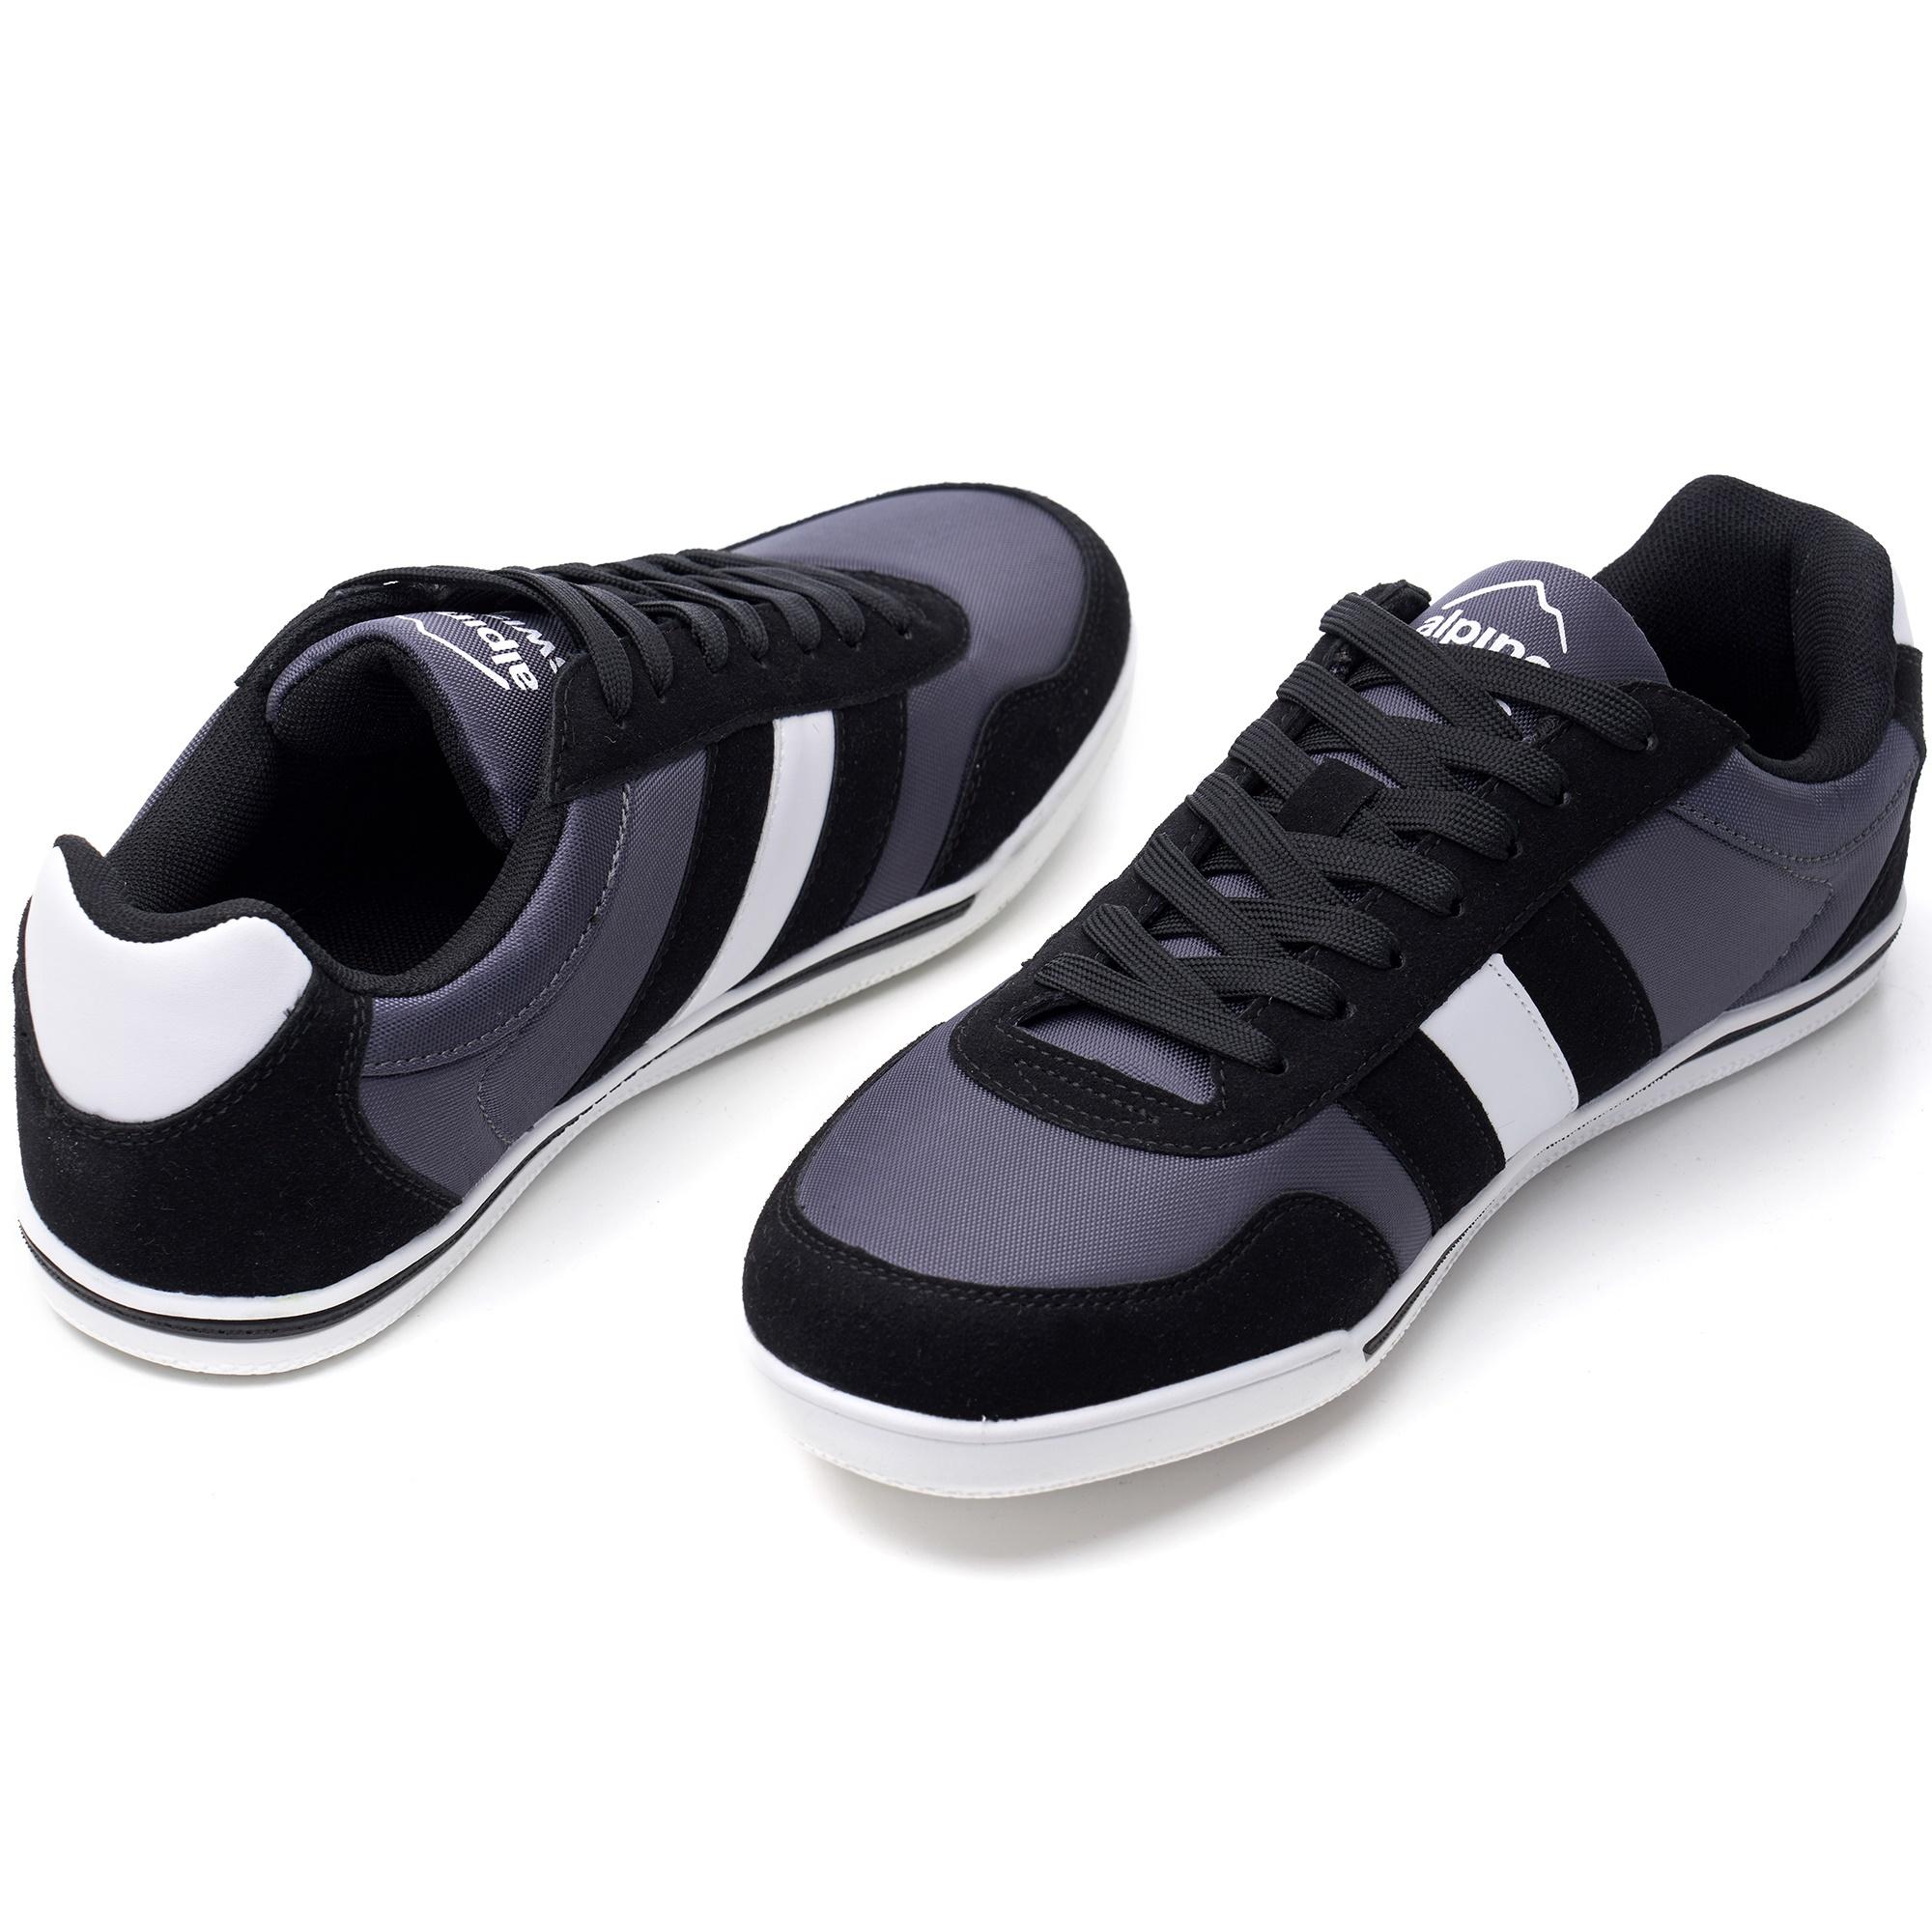 Alpine-Swiss-Haris-Mens-Retro-Striped-Athletic-Shoes-Fashion-Sneaker-Tennis-Shoe thumbnail 7